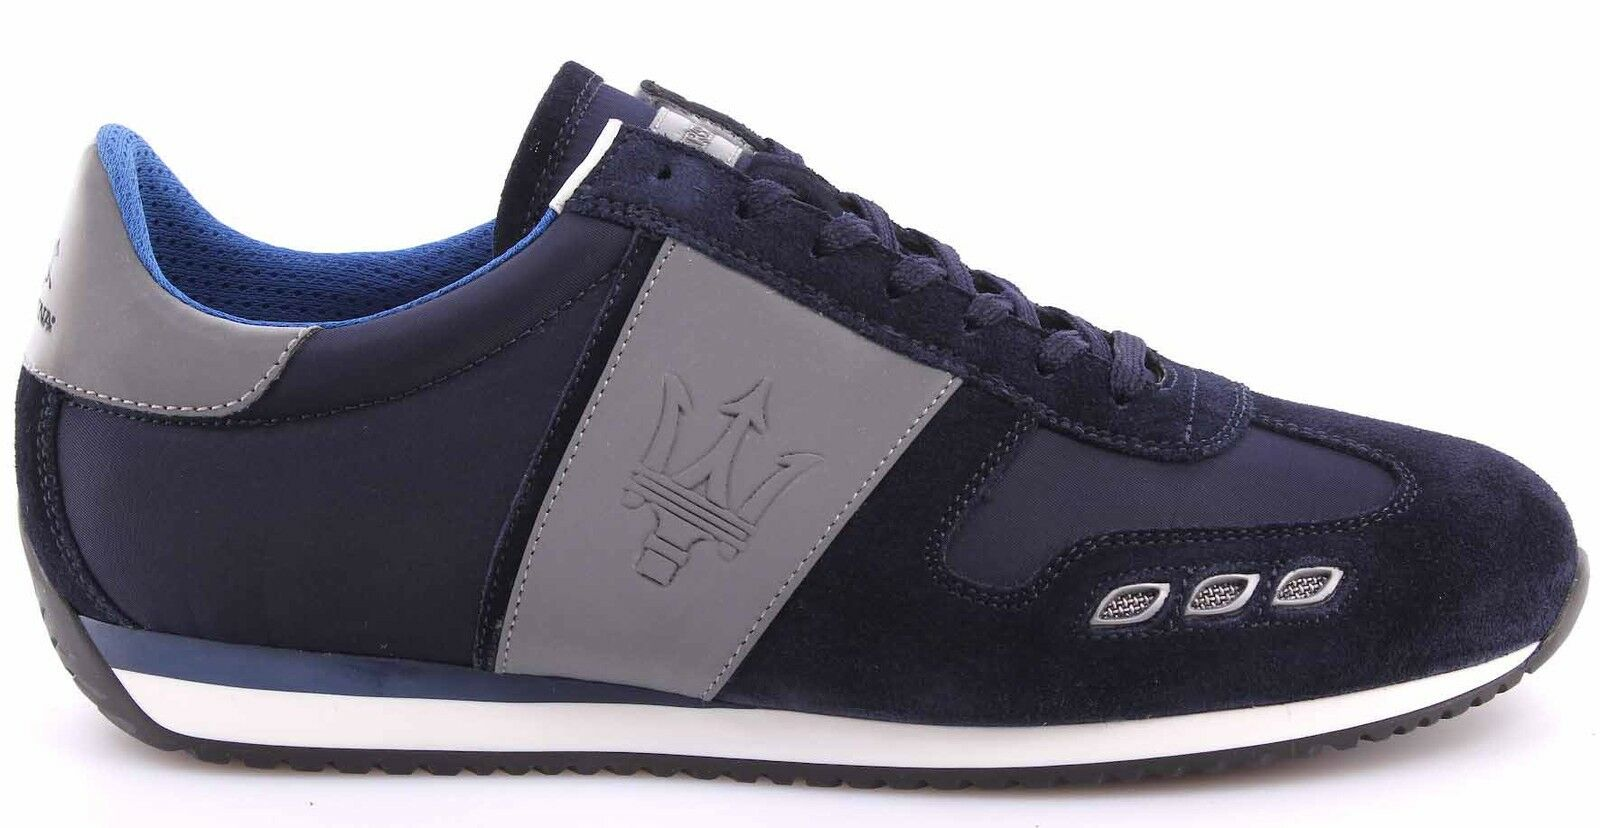 Scarpe Sneakers Uomo MASERATI By Navy LA MARTINA L3095265 Camoscio Navy By Bomber Blue 519d25